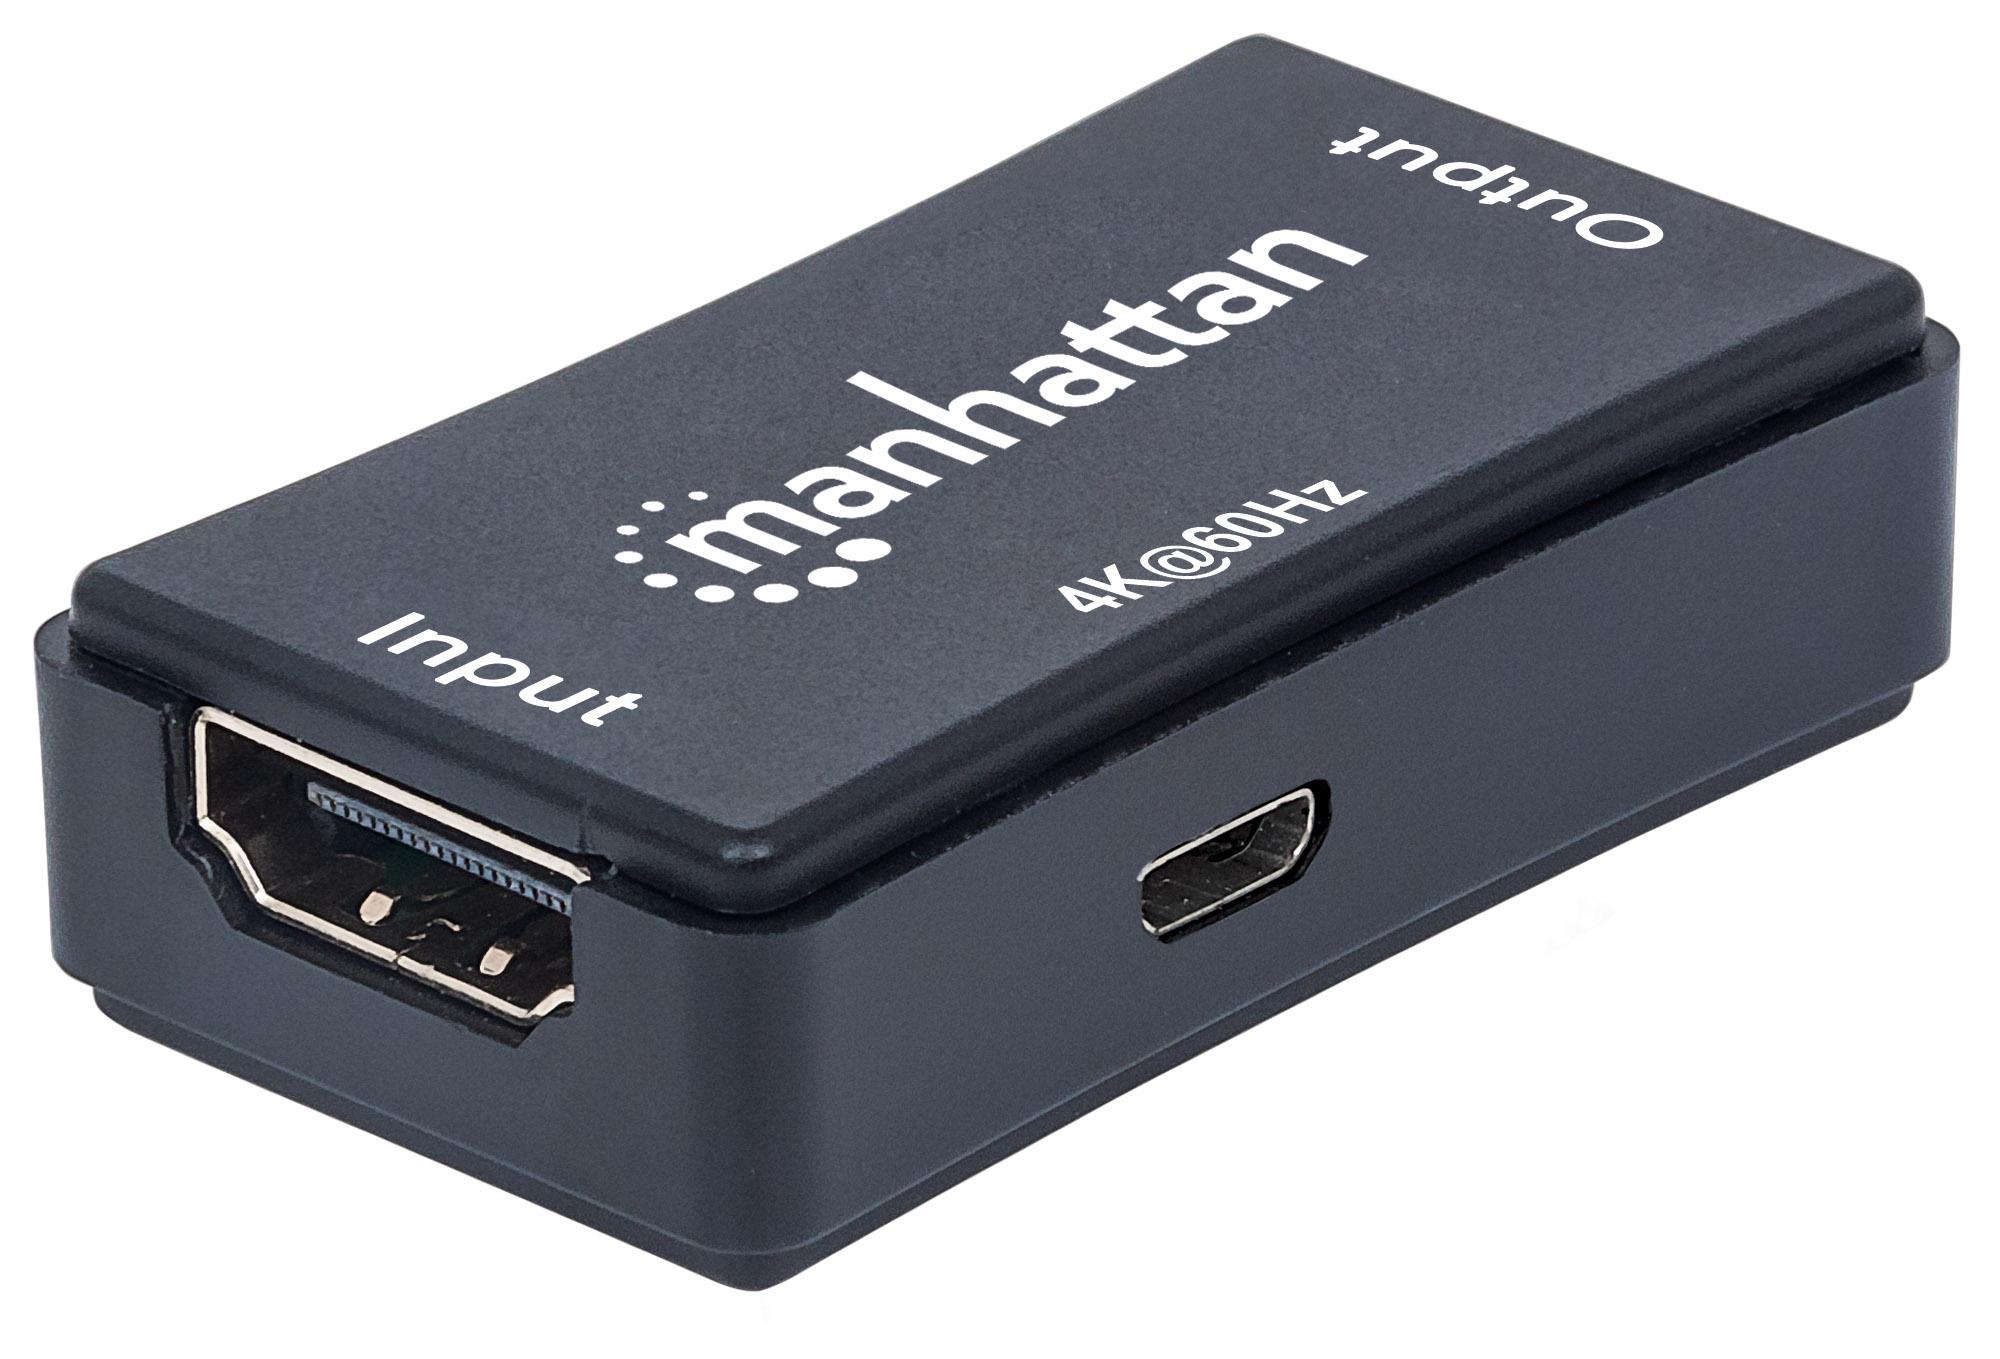 4K HDMI Repeater